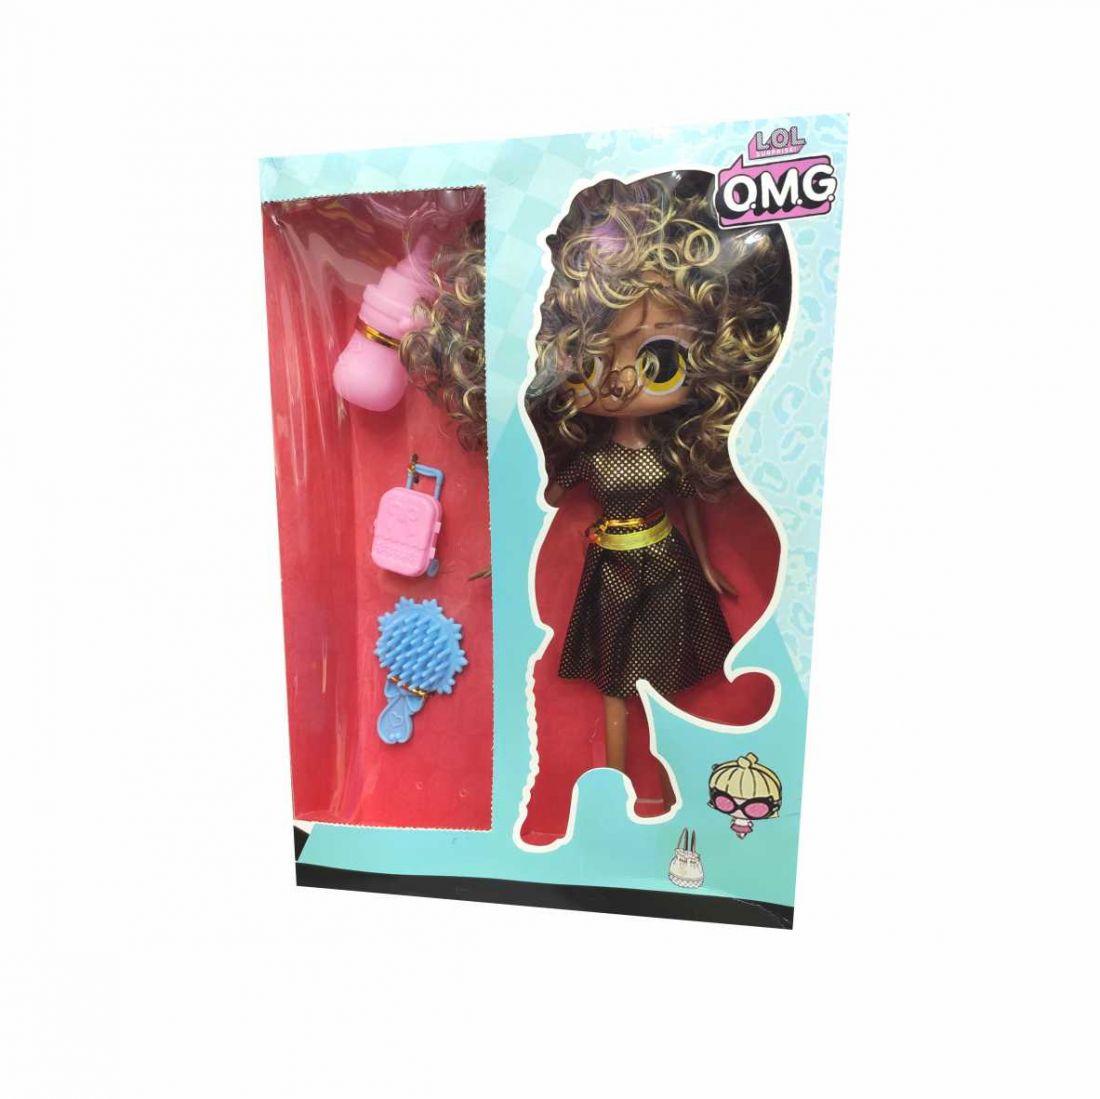 Кукла в коробке LOL OMG кудряшка